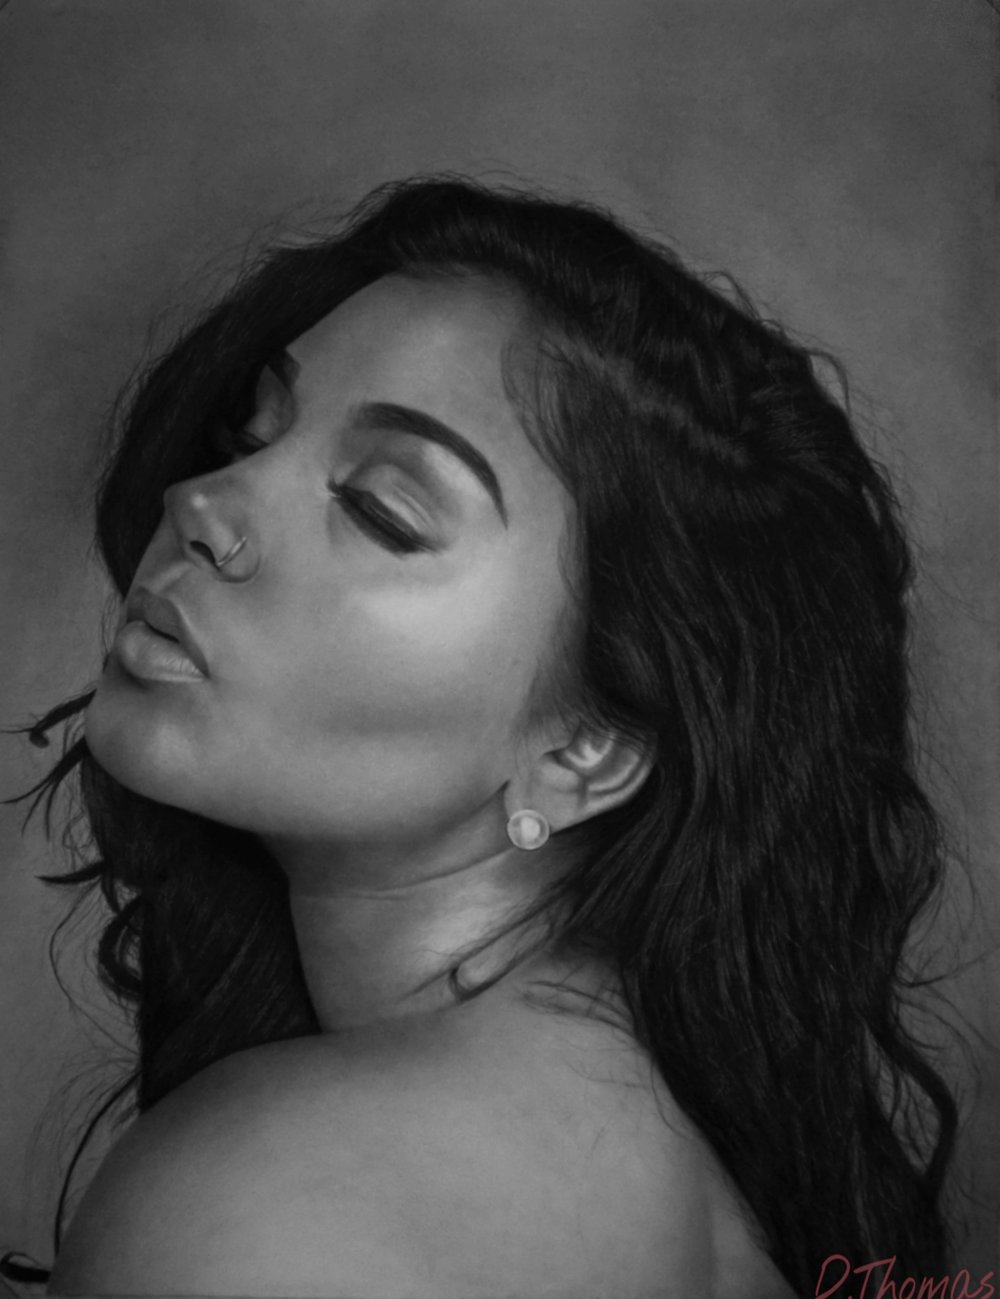 Korena - David Thomas, 2016, Pencil, GalleryTT.com.jpg